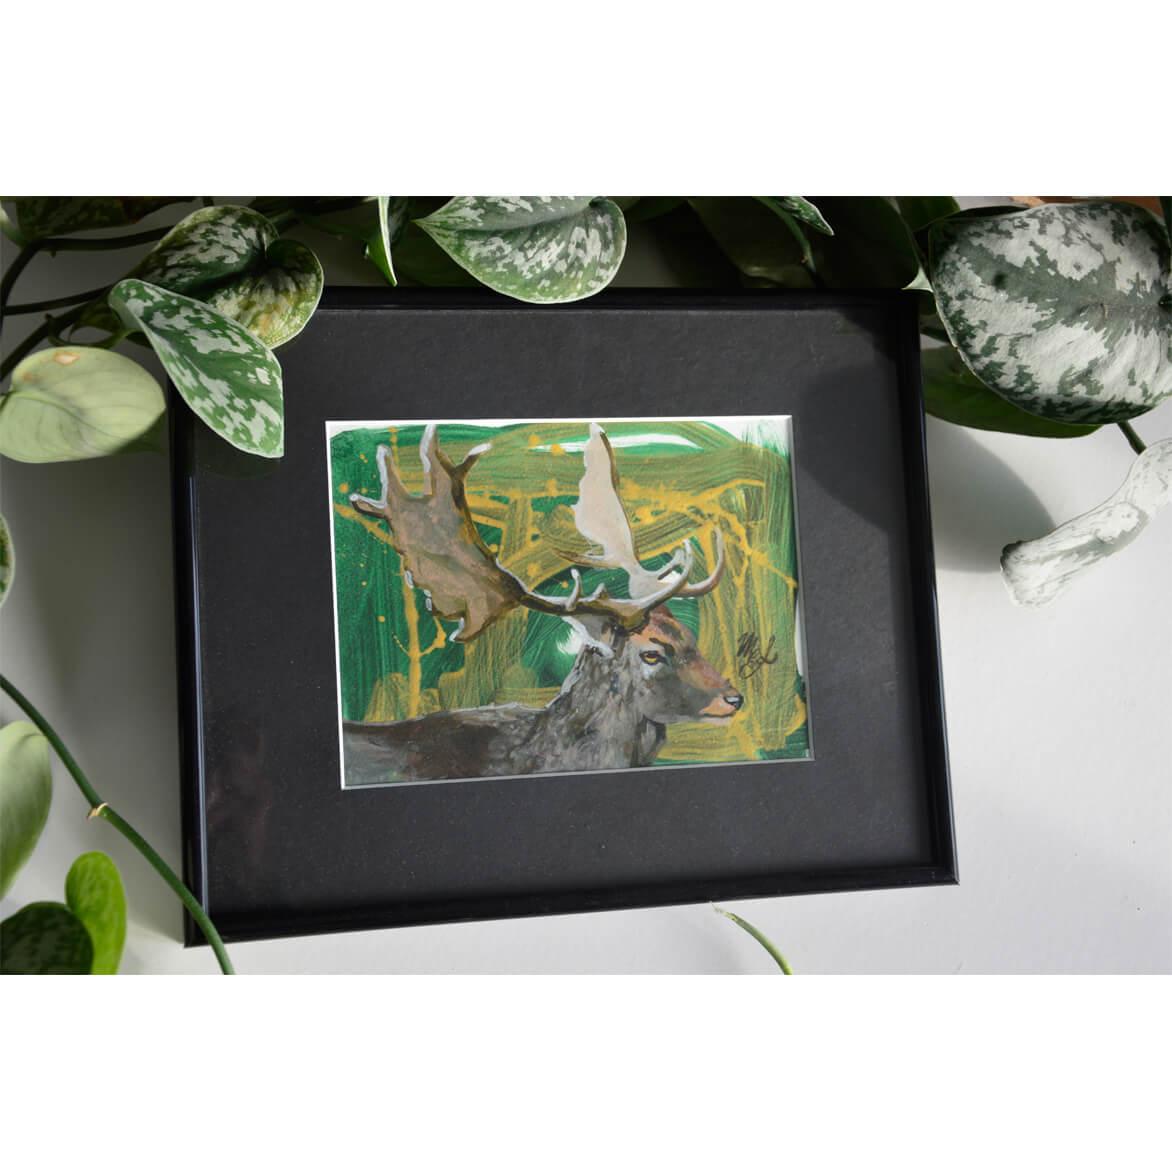 Painting depicting a fallow deer.